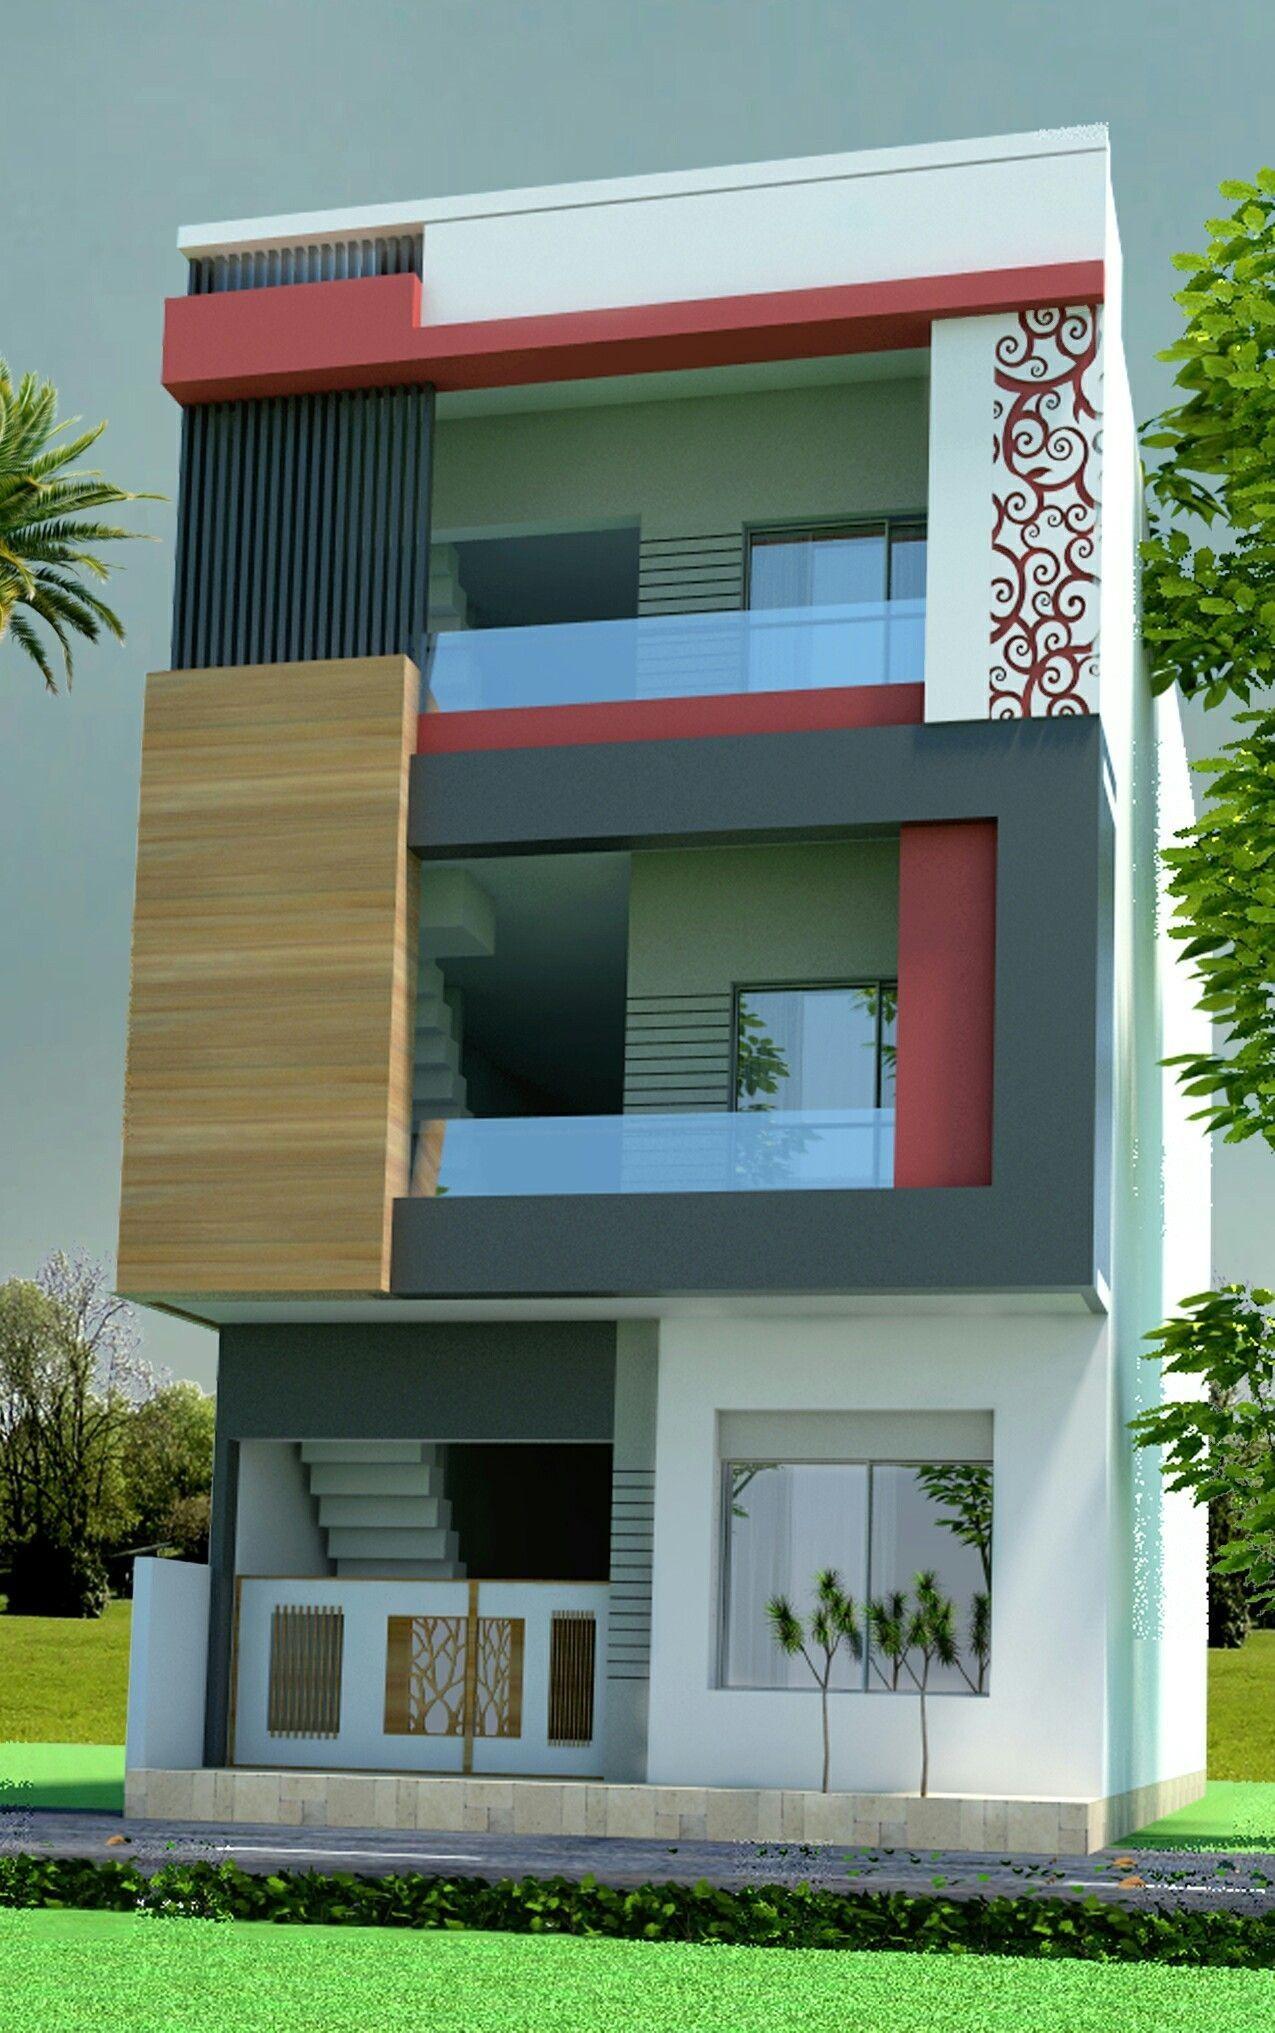 Modern House Design Ideas Small House Design Exterior Modern Exterior House Designs Brick House Designs